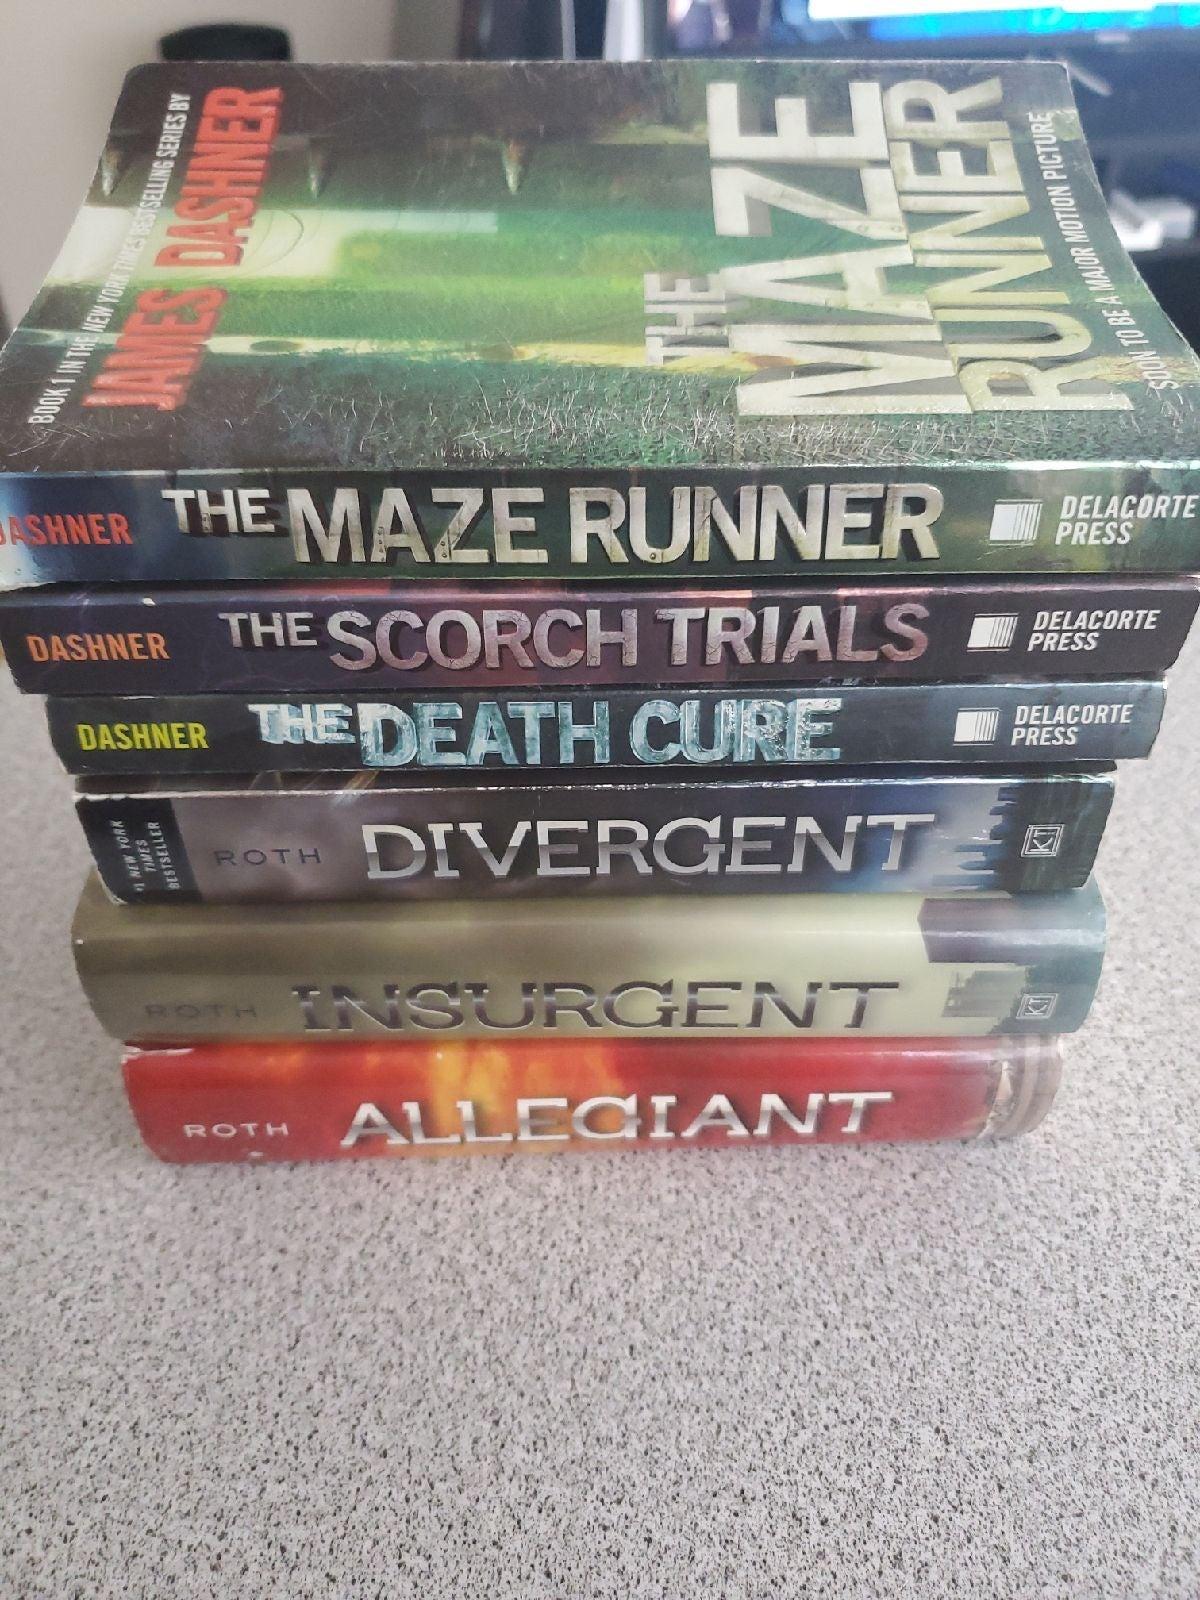 Divergent series and The Maze Runner Ser